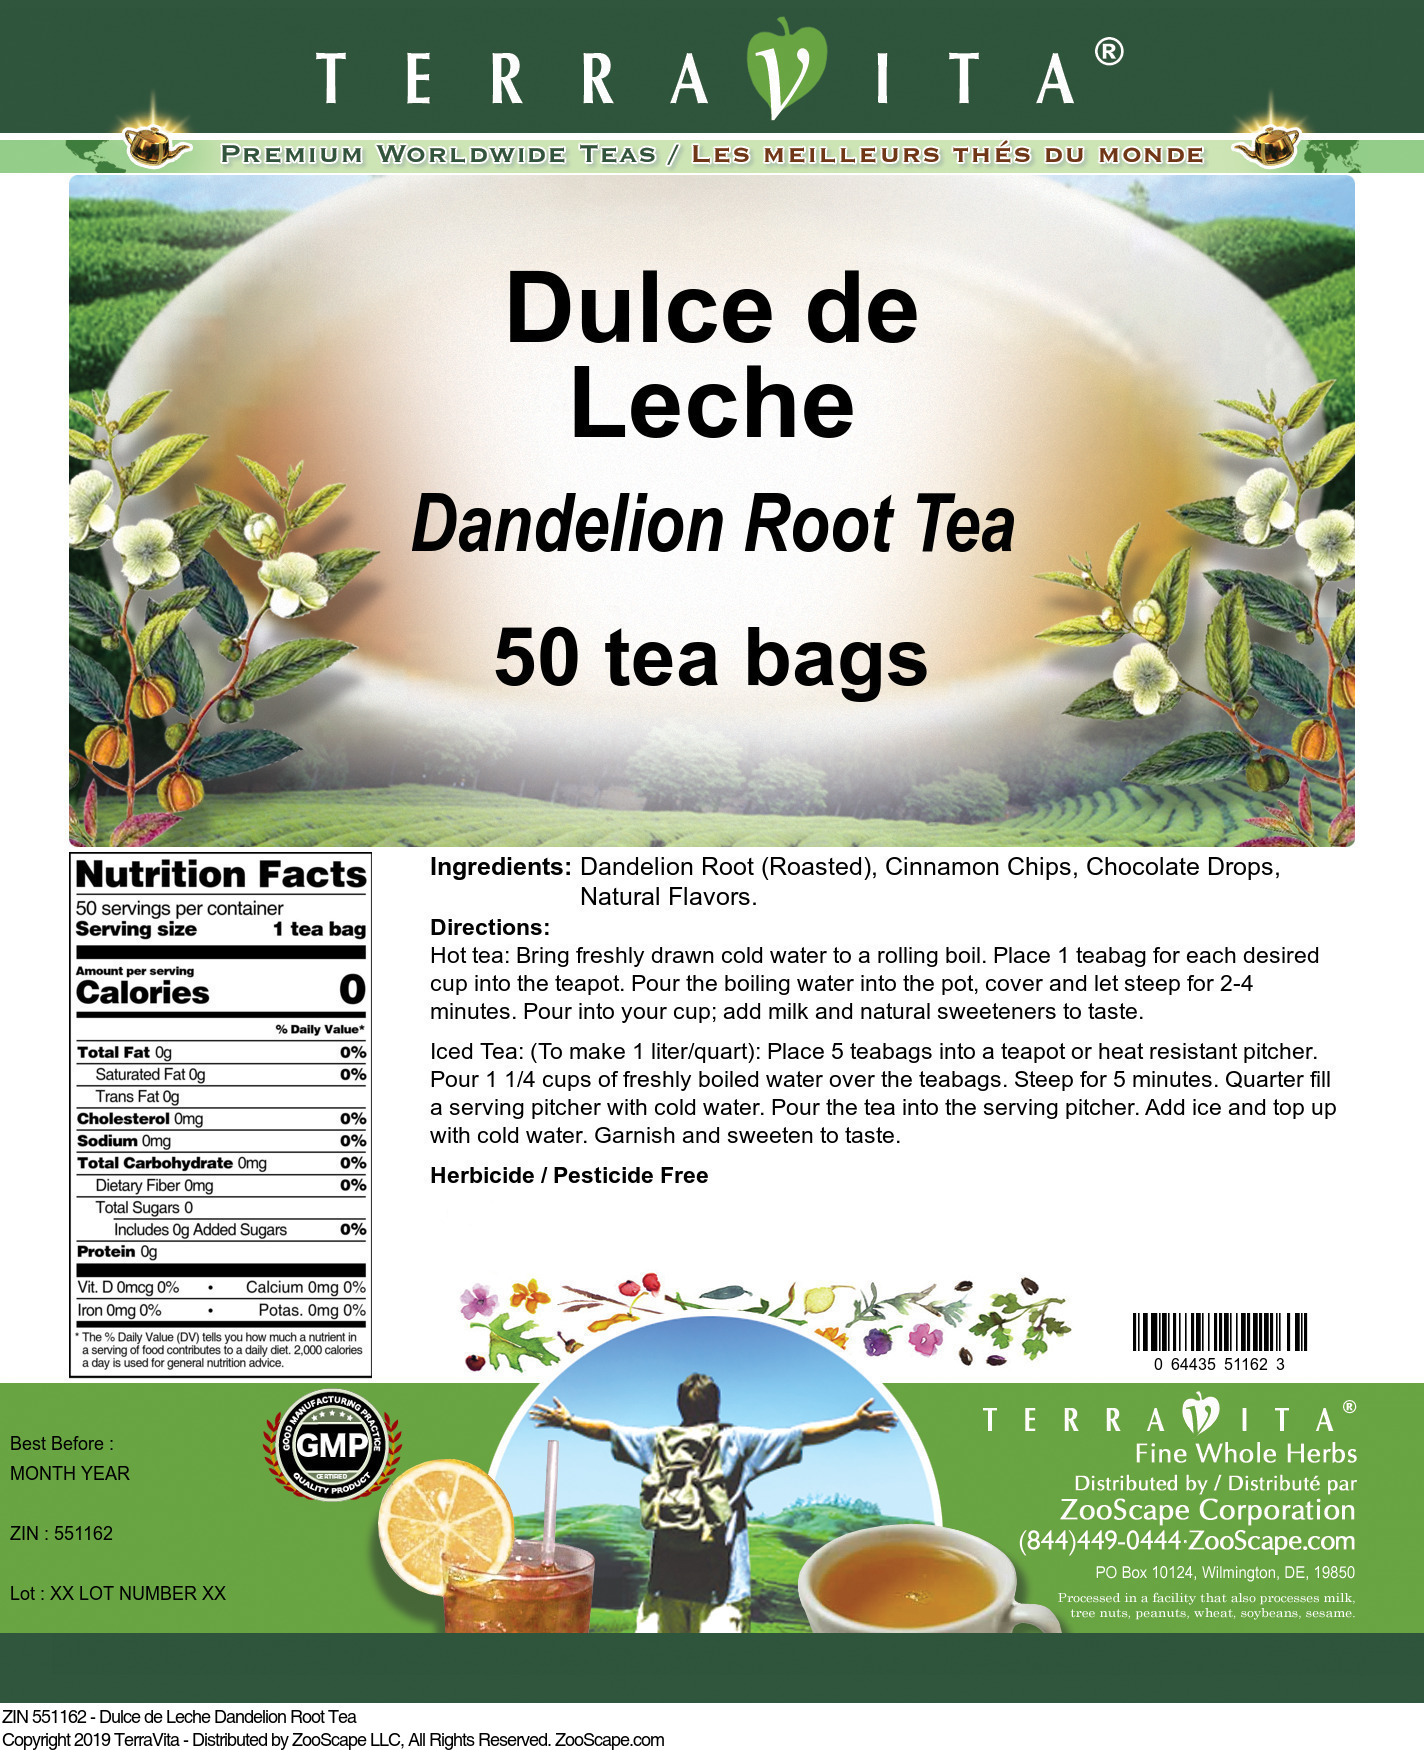 Dulce de Leche Dandelion Root